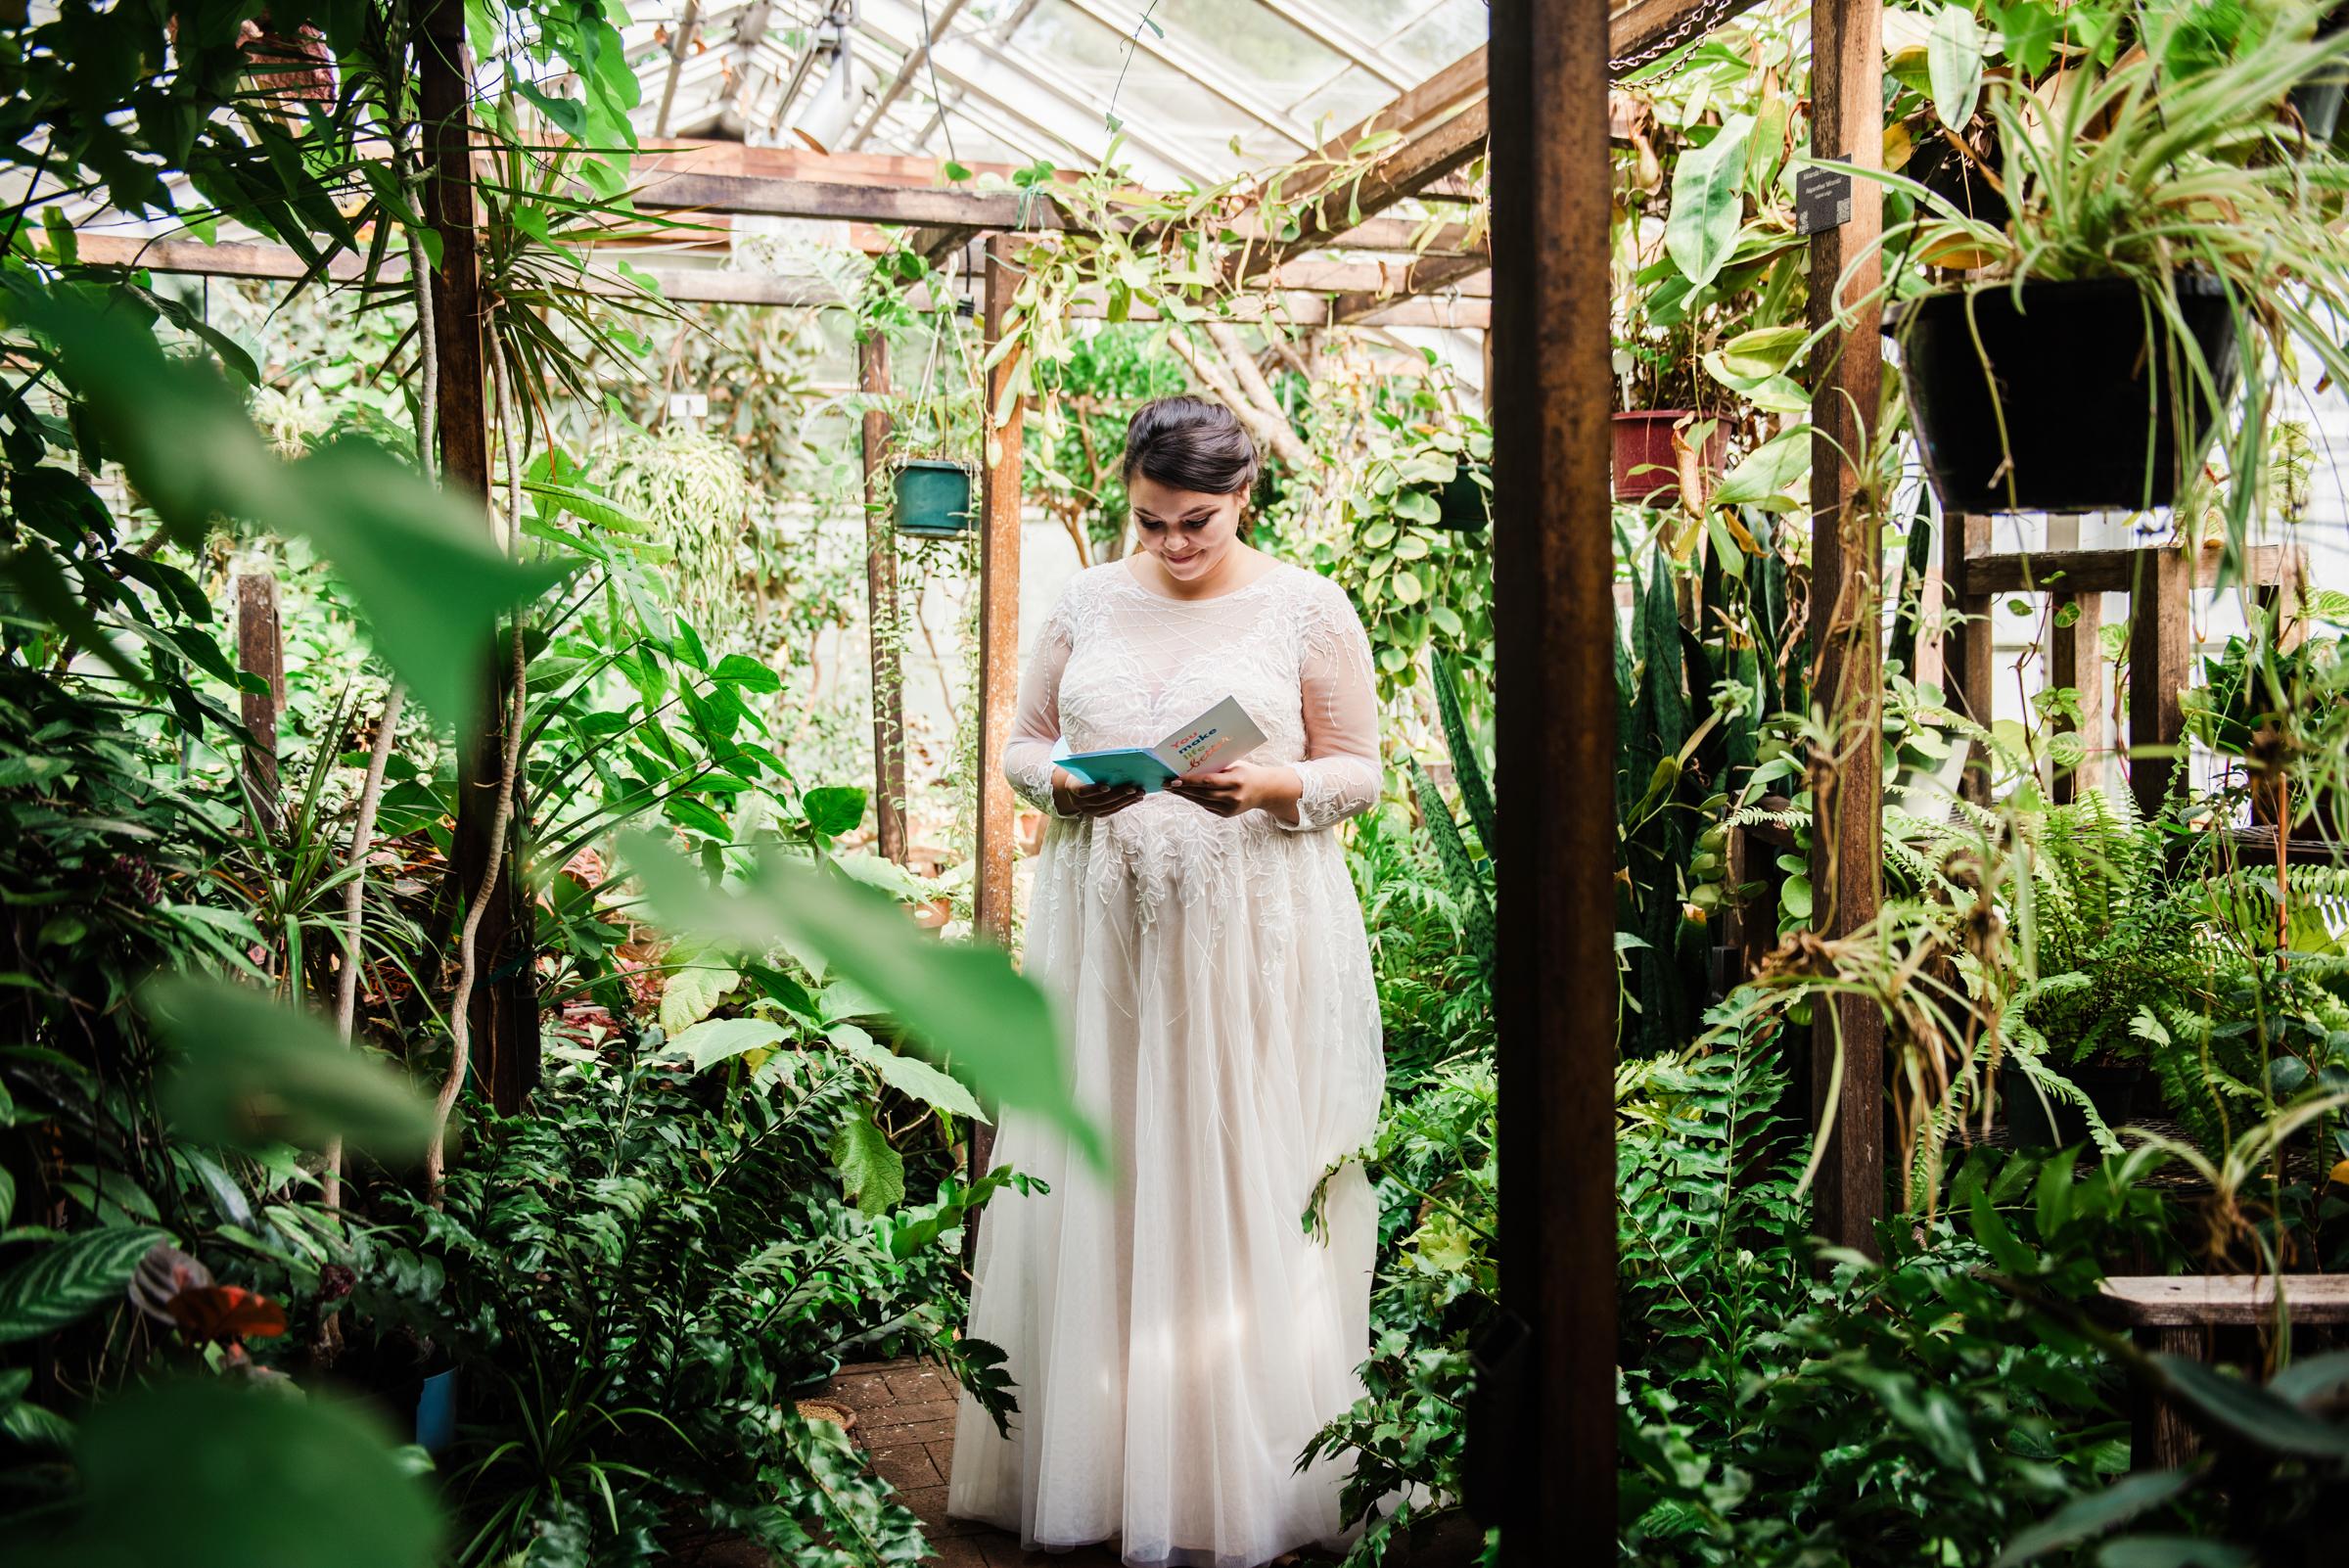 Studio_180_Lamberton_Conservatory_Rochester_Wedding_JILL_STUDIO_Rochester_NY_Photographer_DSC_8340.jpg